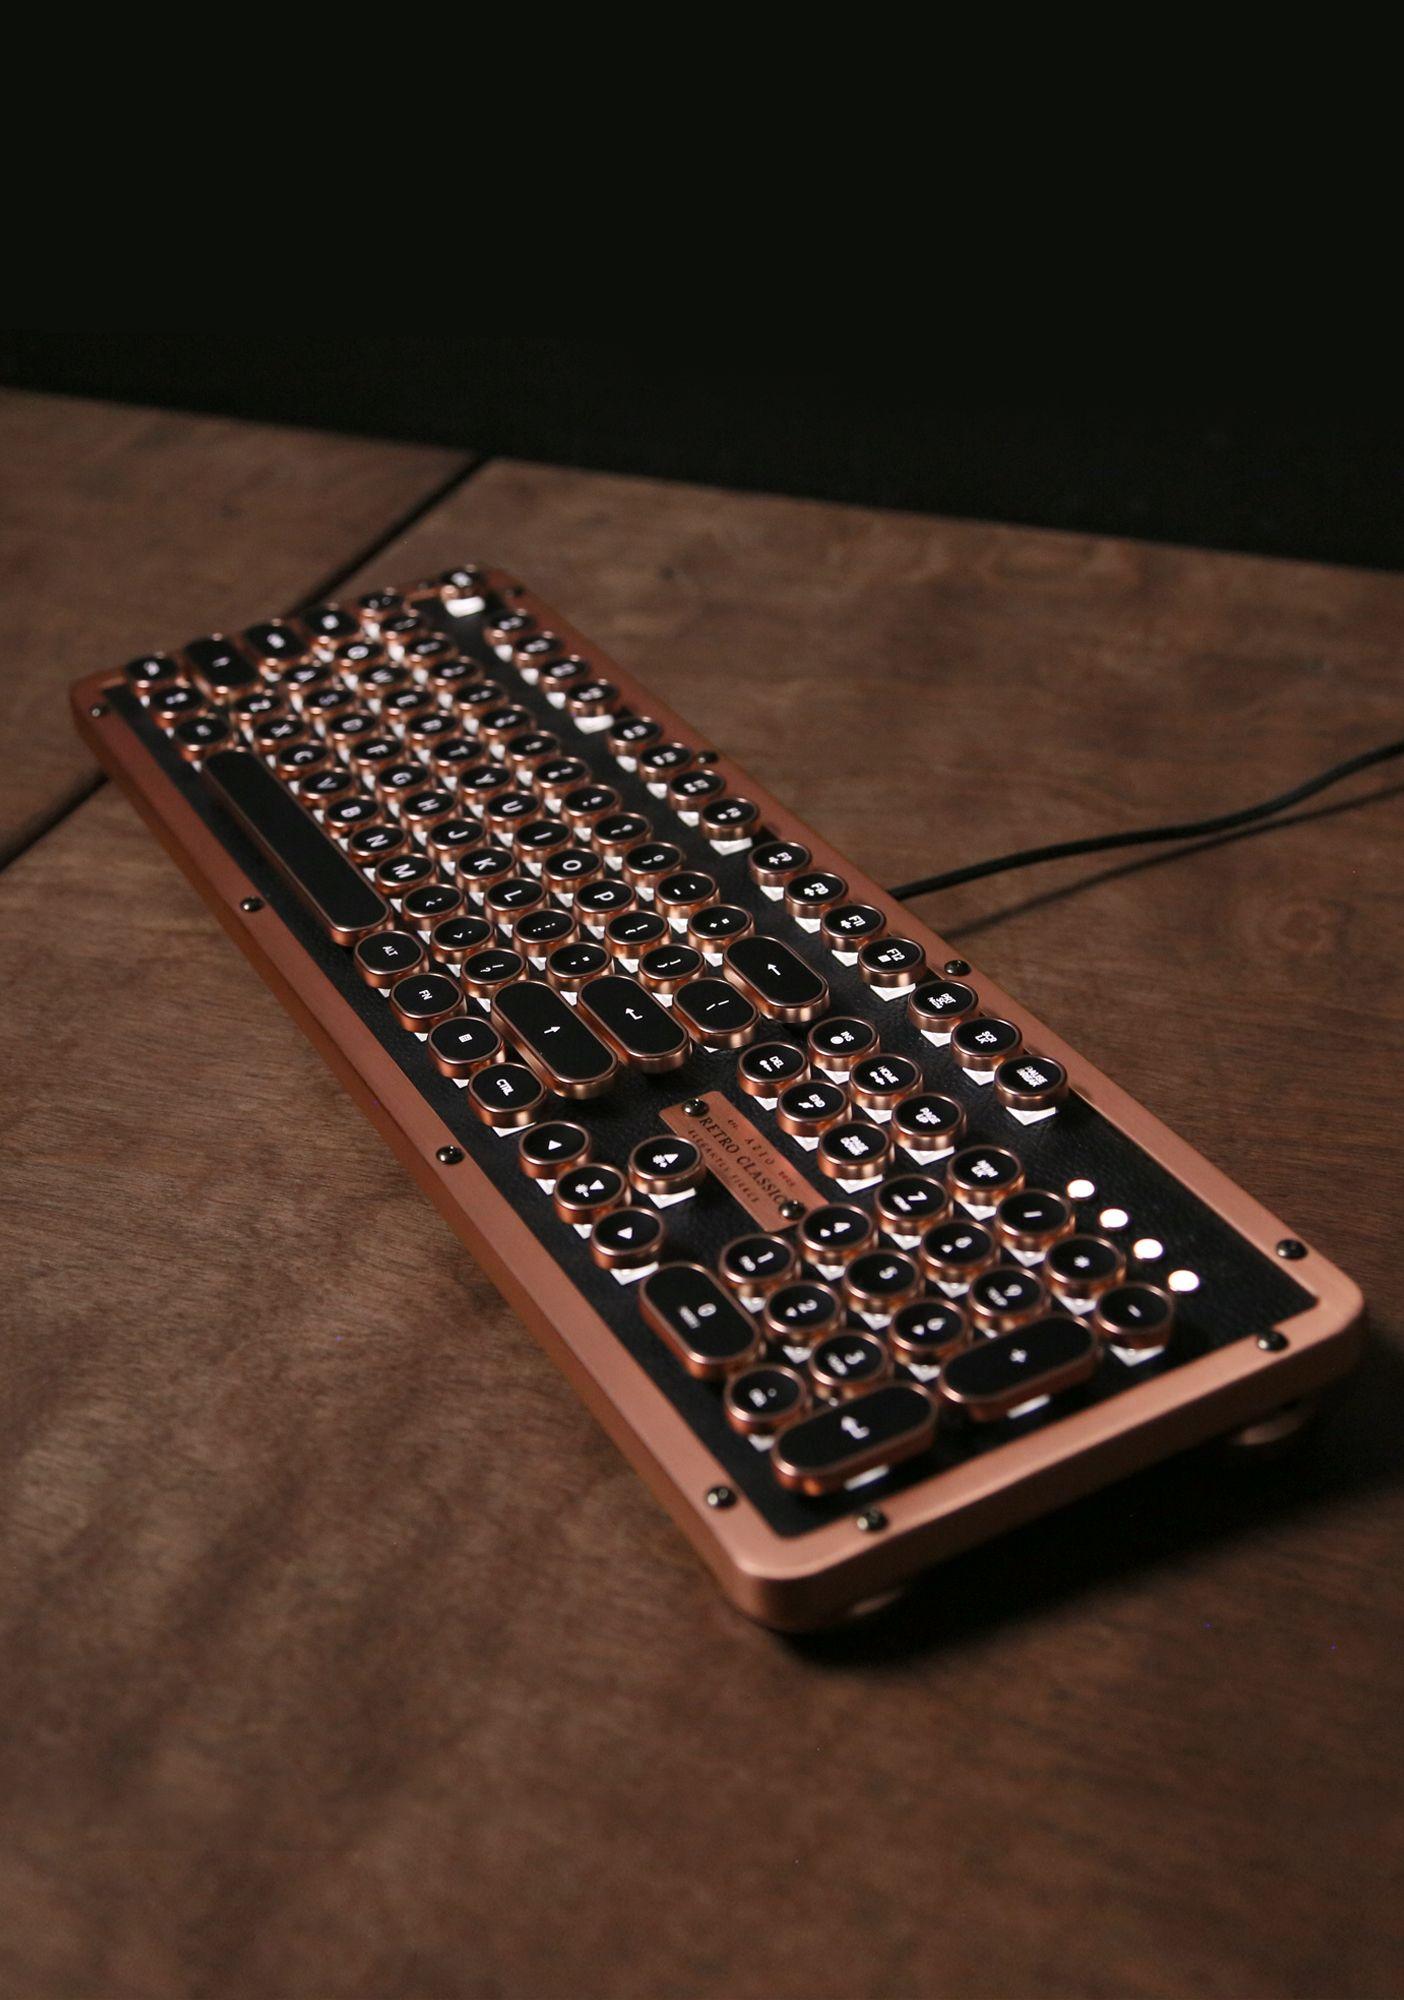 Retro Classic Artisan Luxury Vintage Keyboard Steampunk Aesthetic Vintage Typewriter Inspired And Made Of Leat Retro Typewriter Keyboards Custom Computer